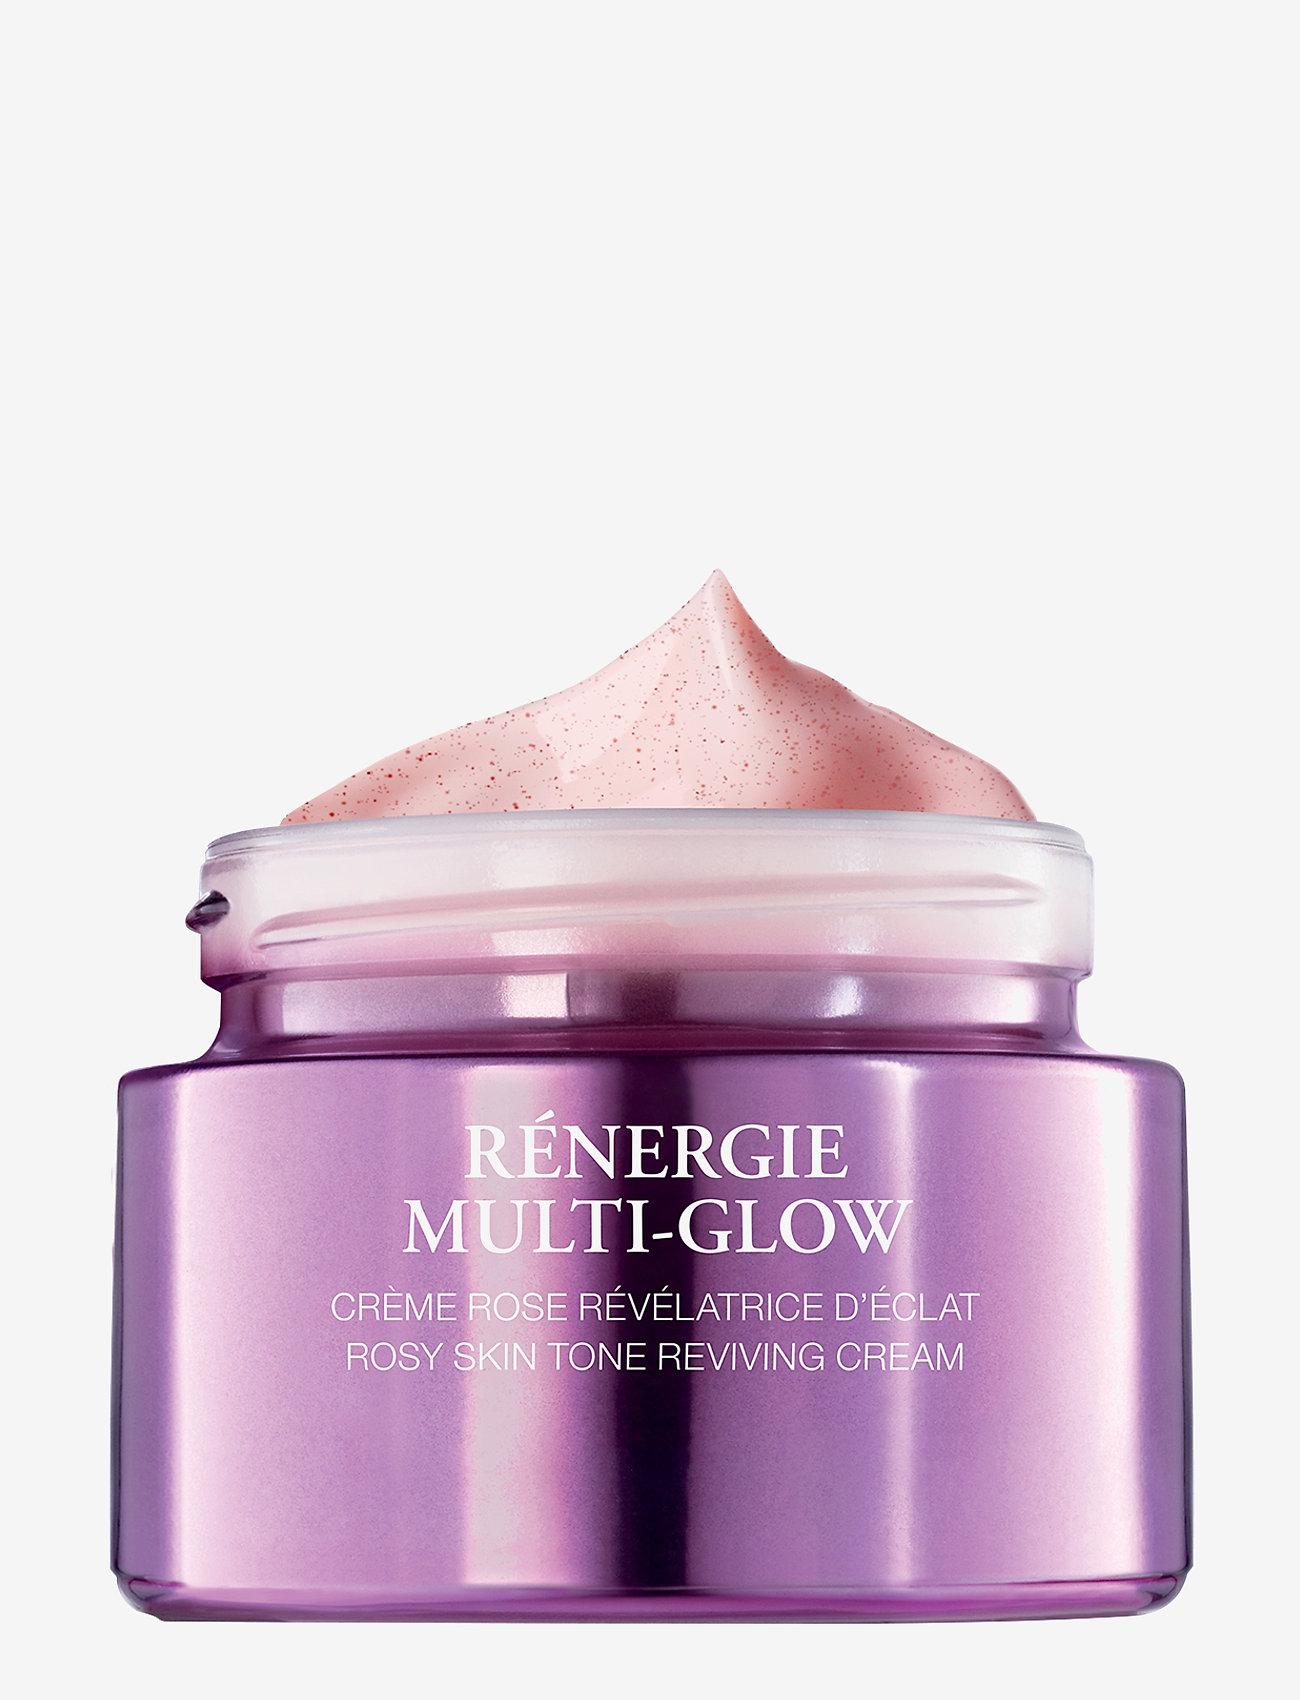 Lancôme - Rénergie Multi-Glow  Rosy Skin Tone Reviving Cream 50 ml - dagcreme - clear - 1